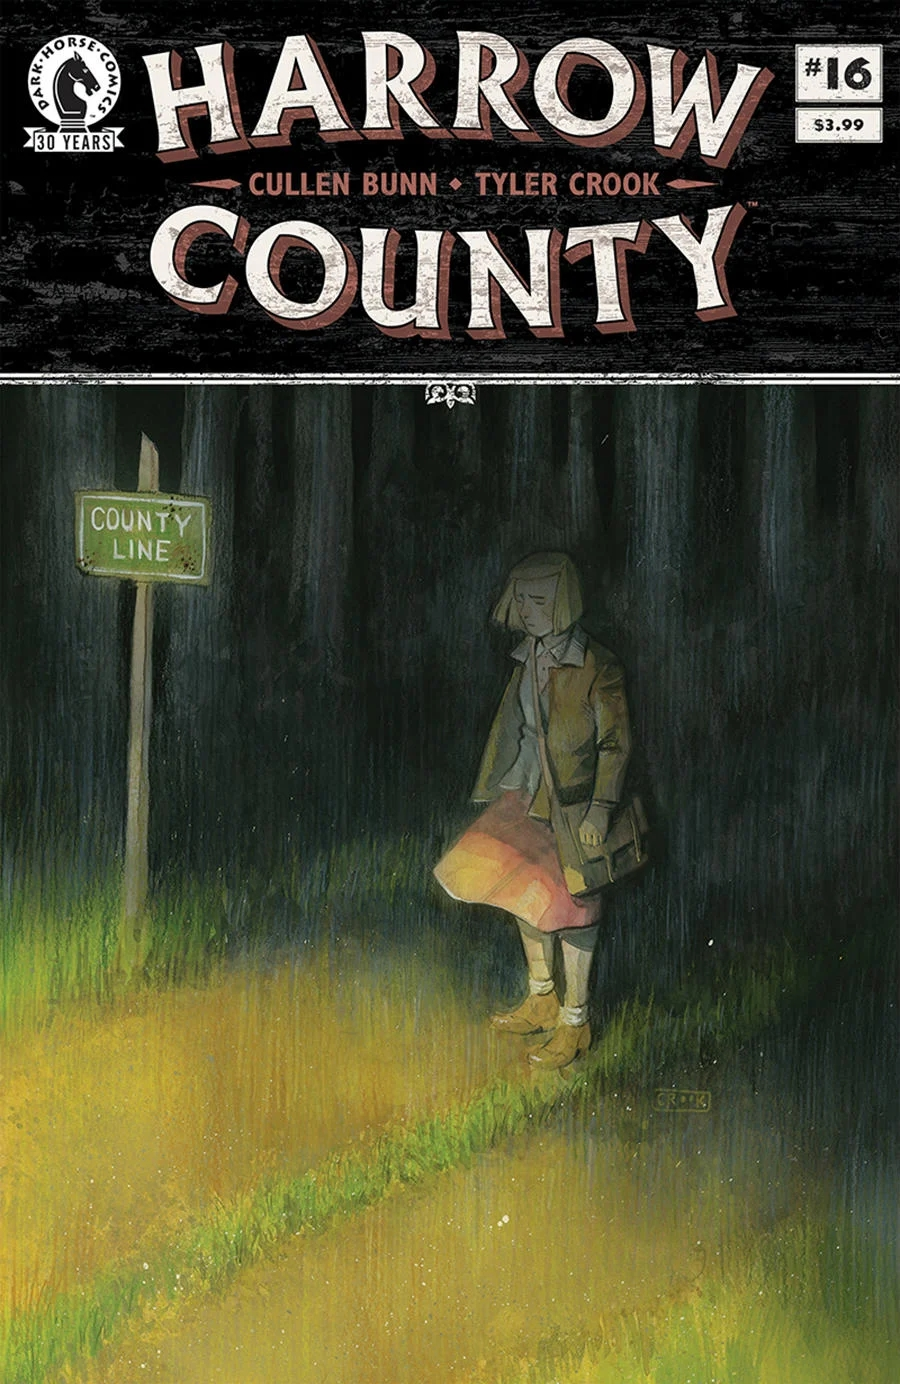 Hcounty